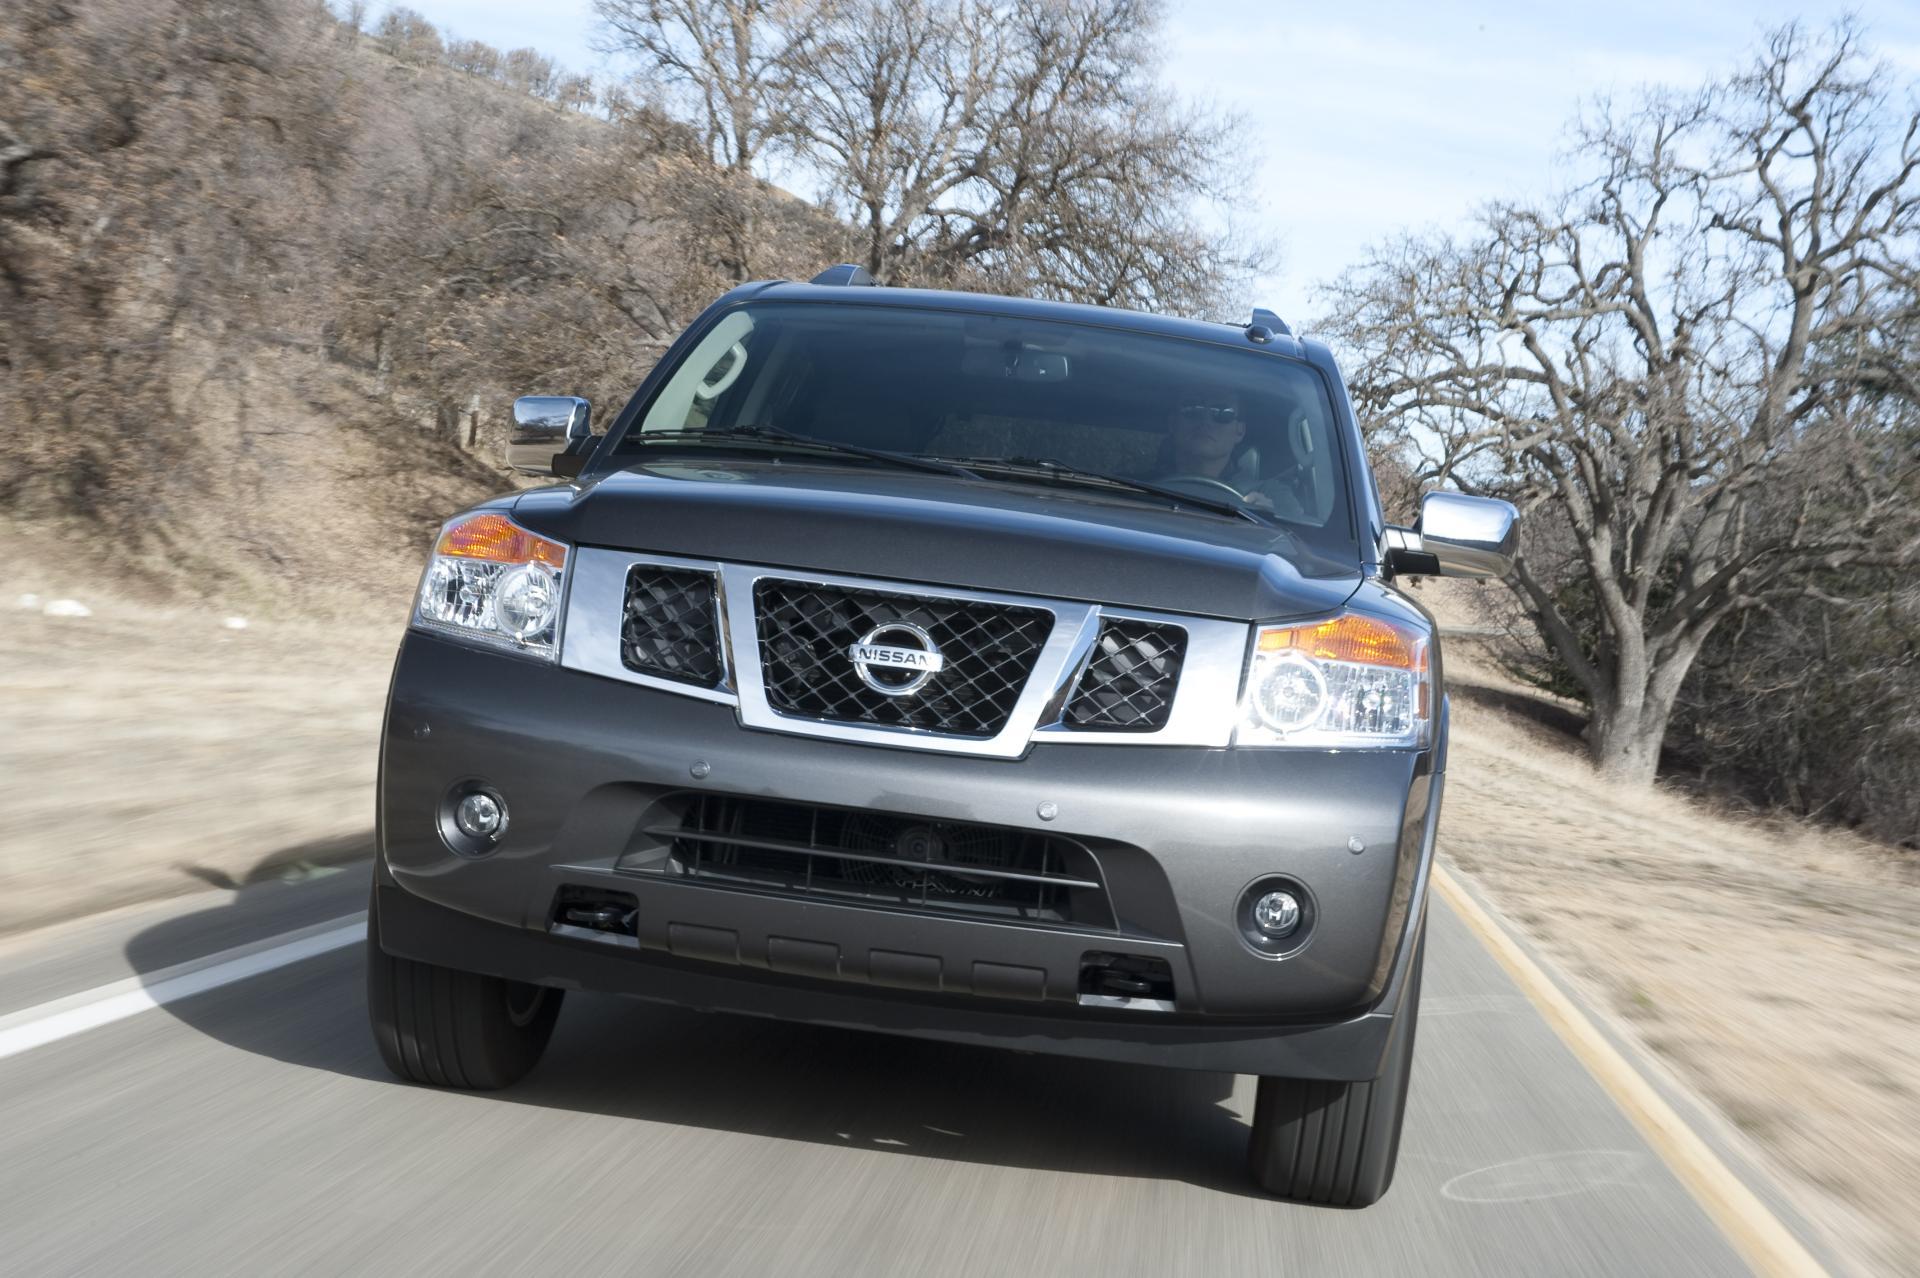 2012 Nissan Armada Image